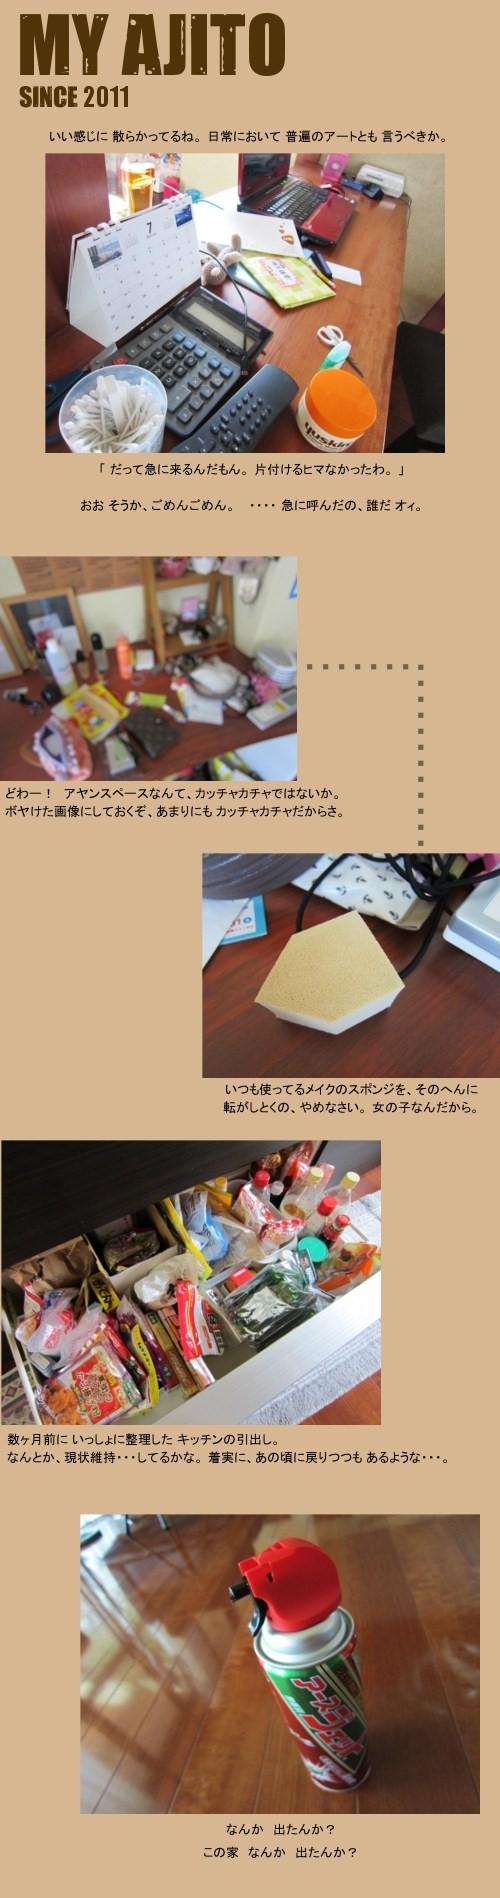 tsuke_04.jpg